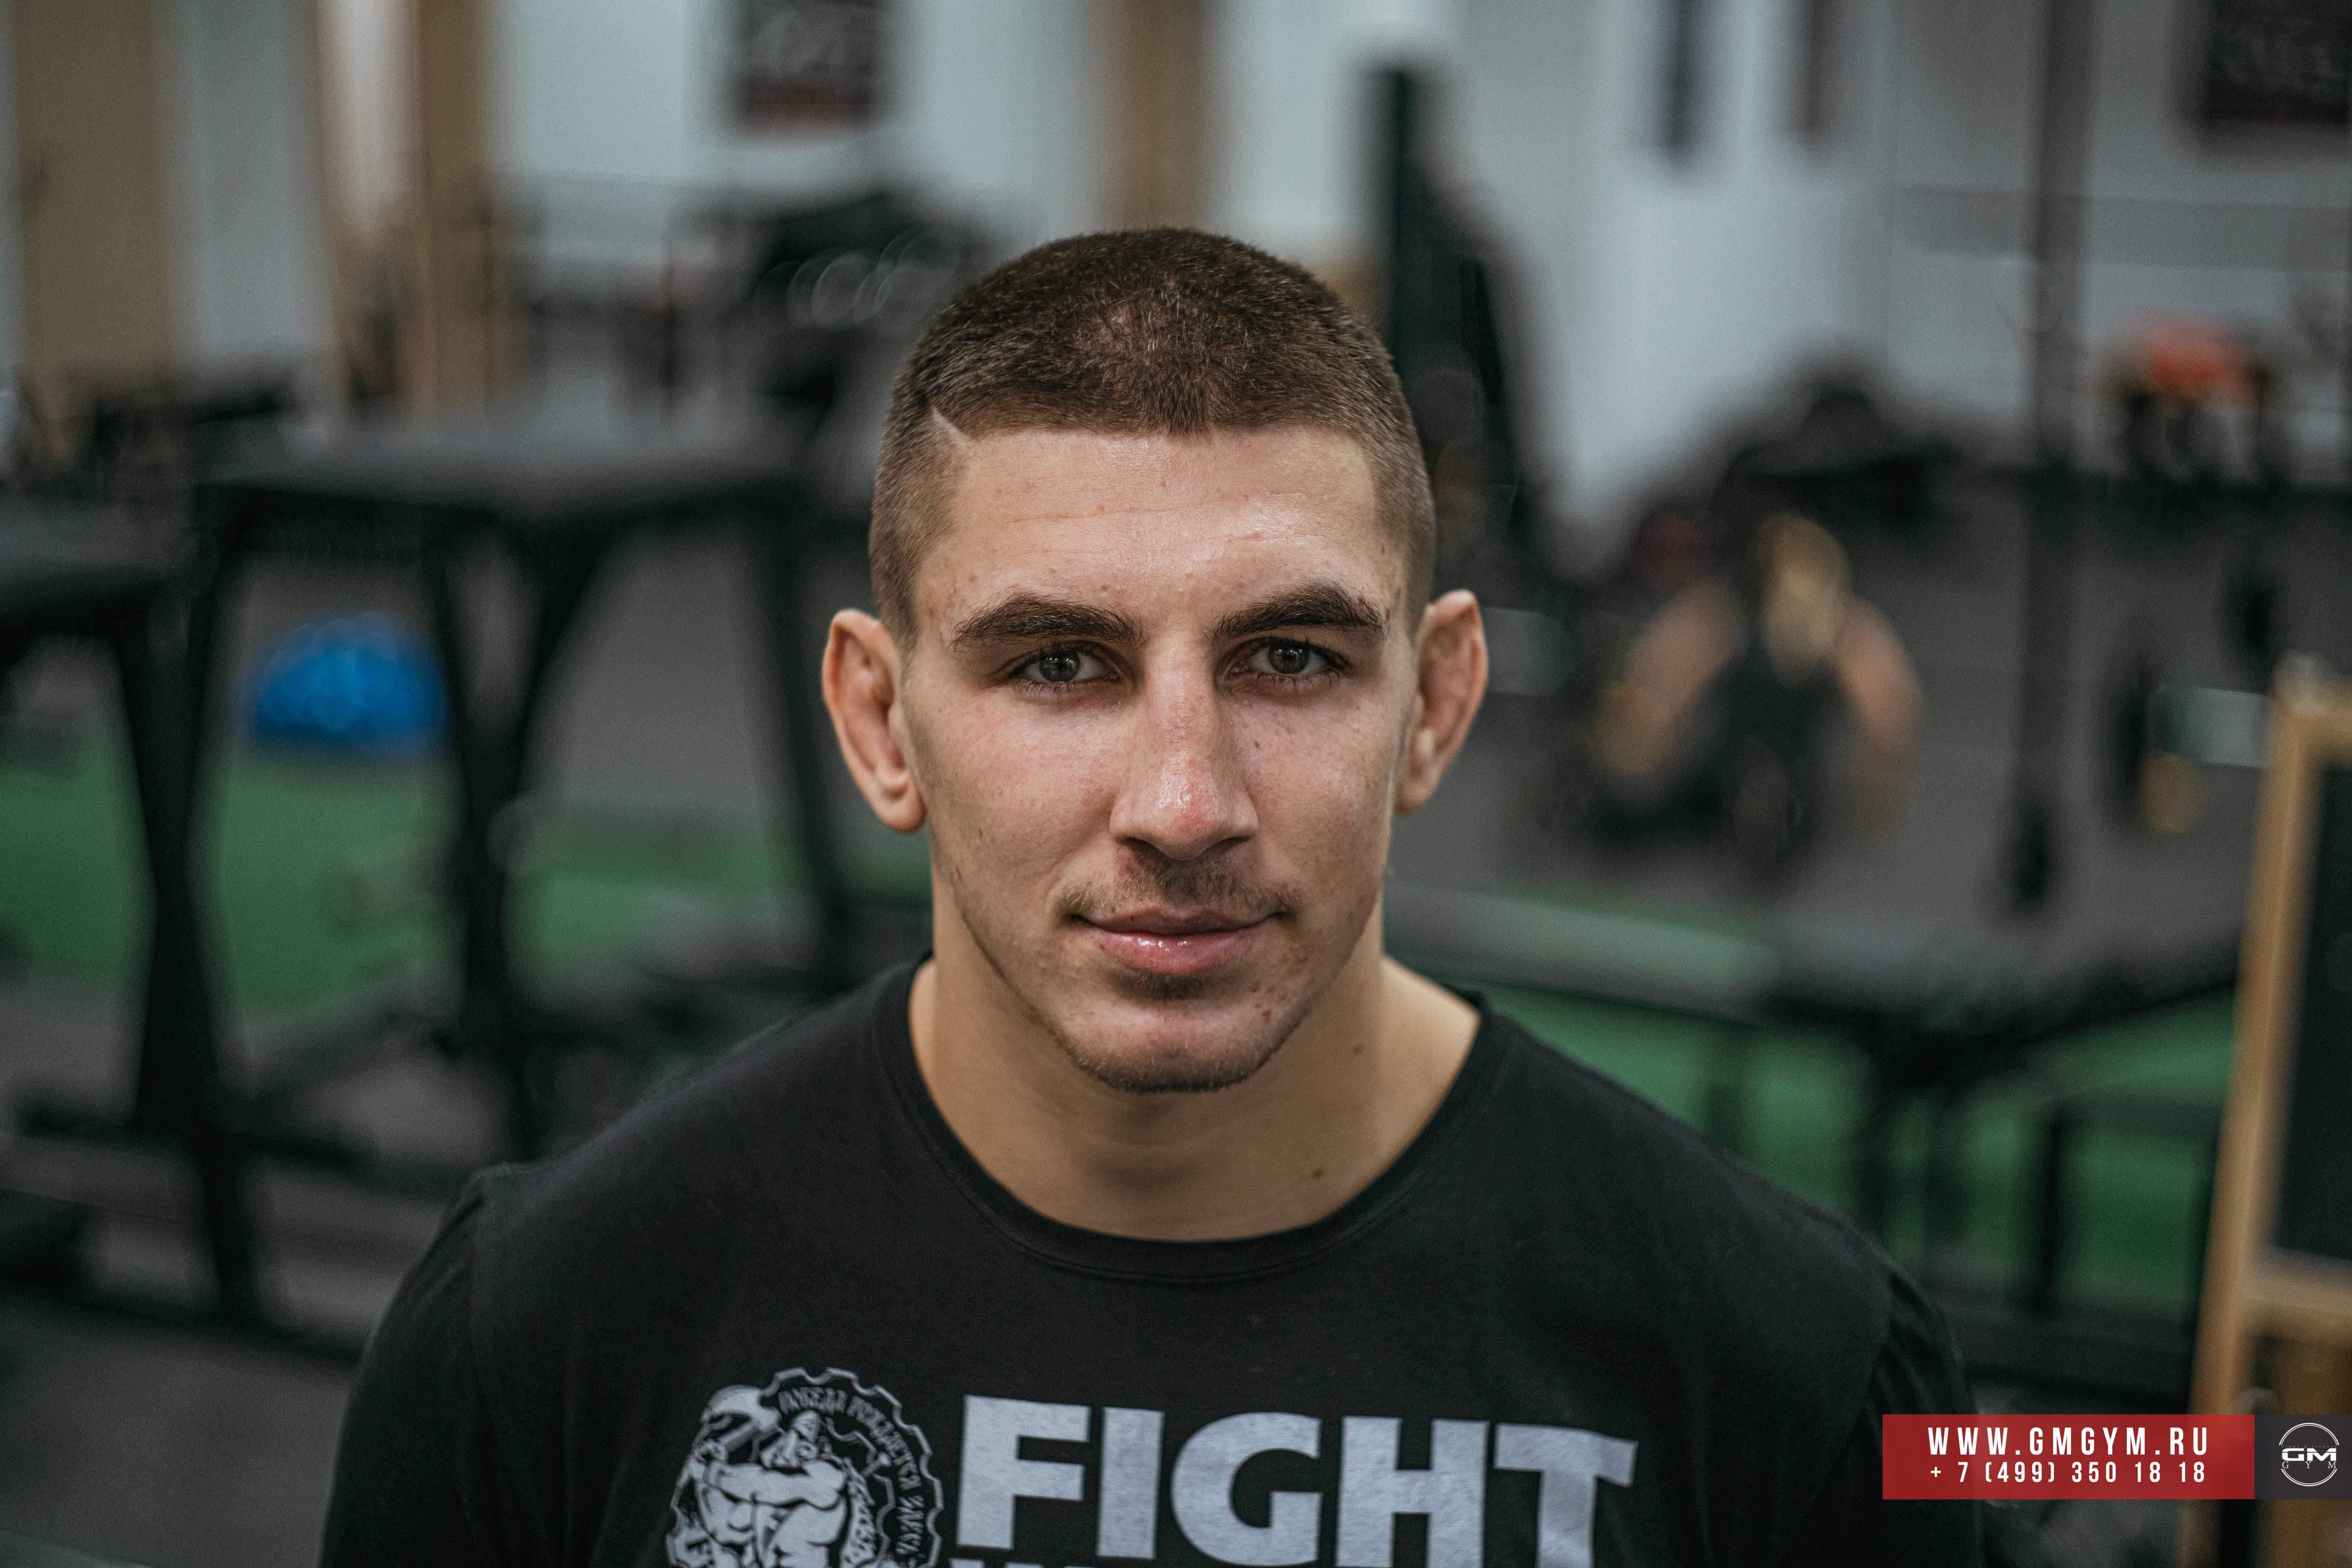 Виталий Слипенко тренер по ММА 3